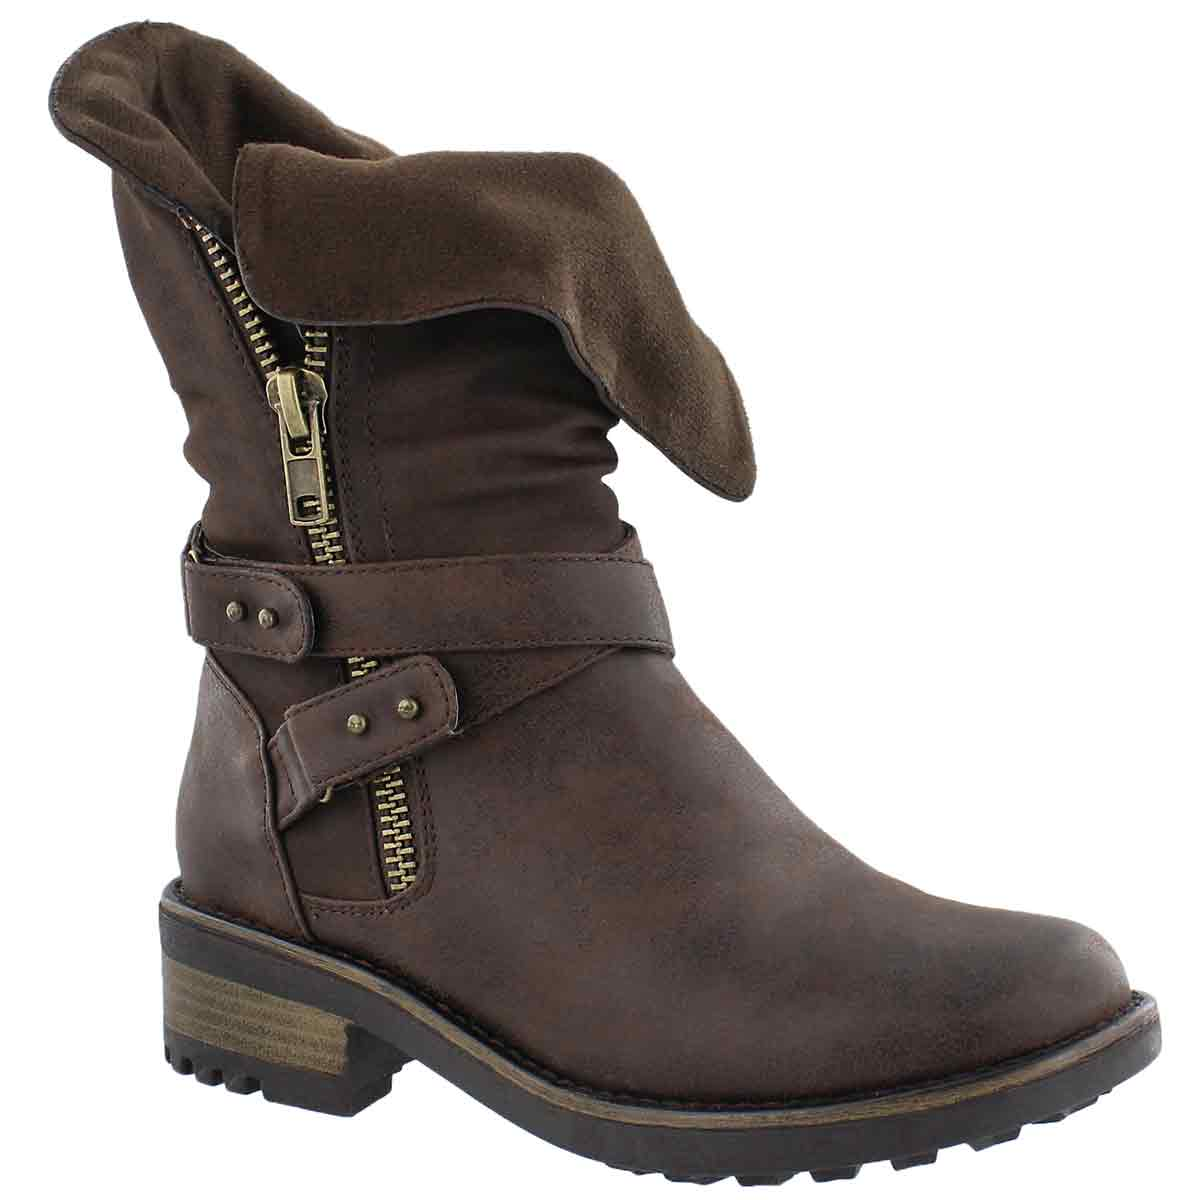 Women's BELLATRIX brown casual combat boots